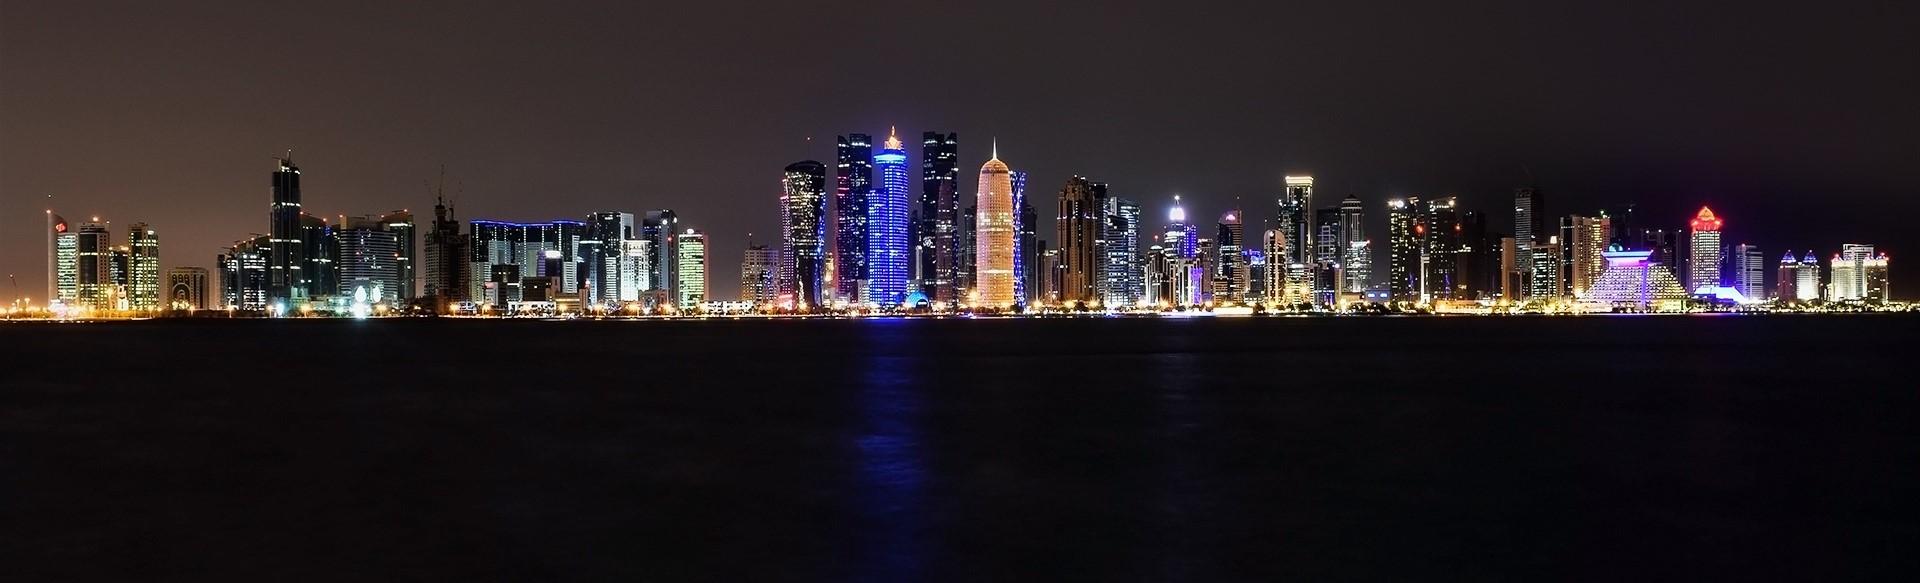 Arabian Peninsula: Qatar, Oman, and U.A.E.